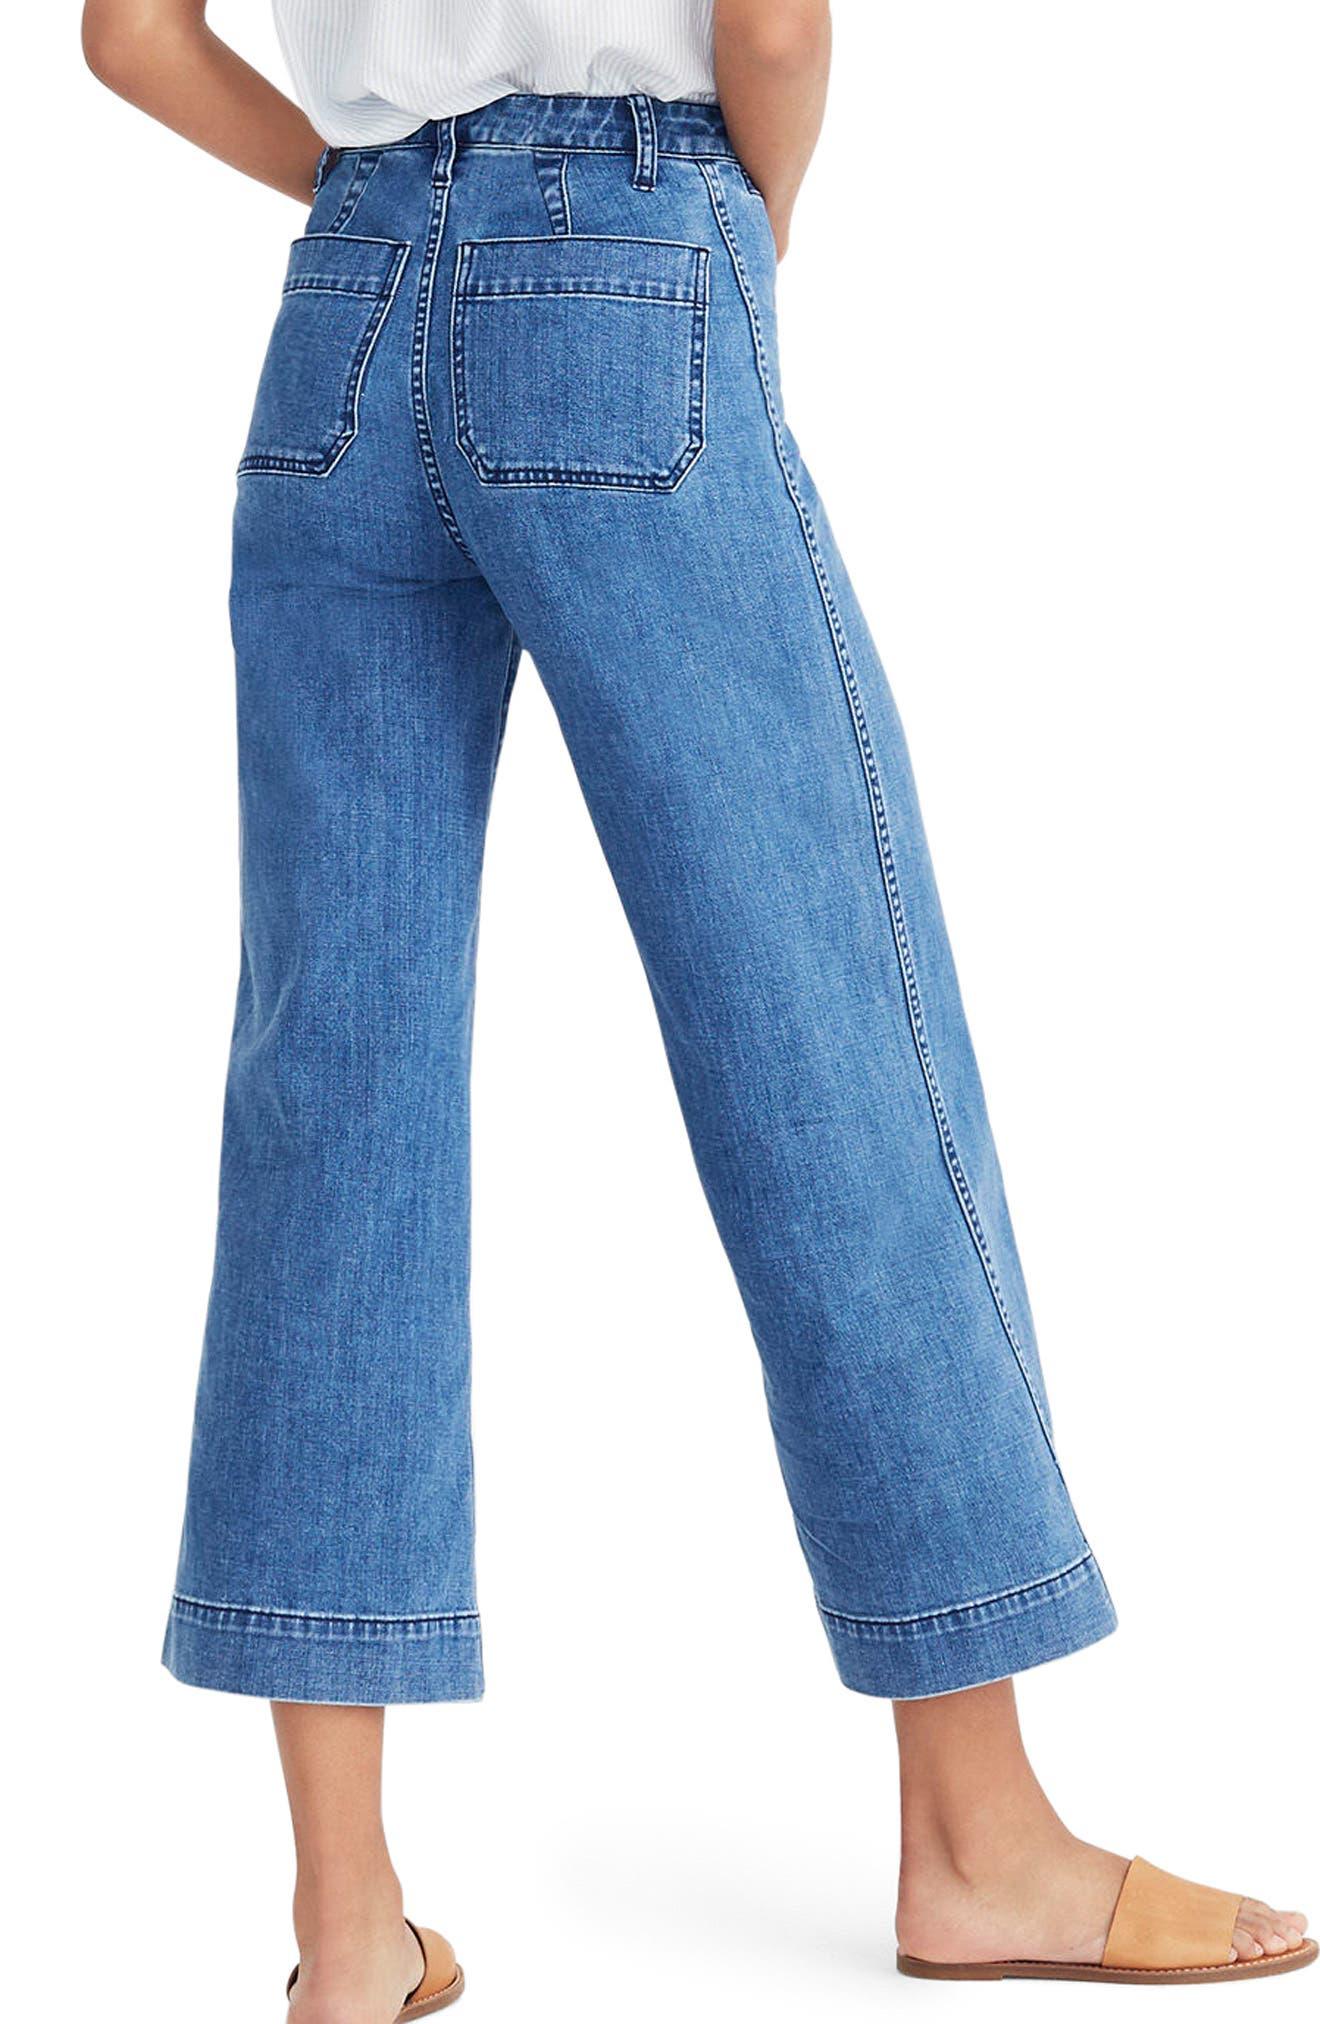 MADEWELL,                             Emmett Crop Wide Leg Jeans,                             Alternate thumbnail 2, color,                             ROSALIE